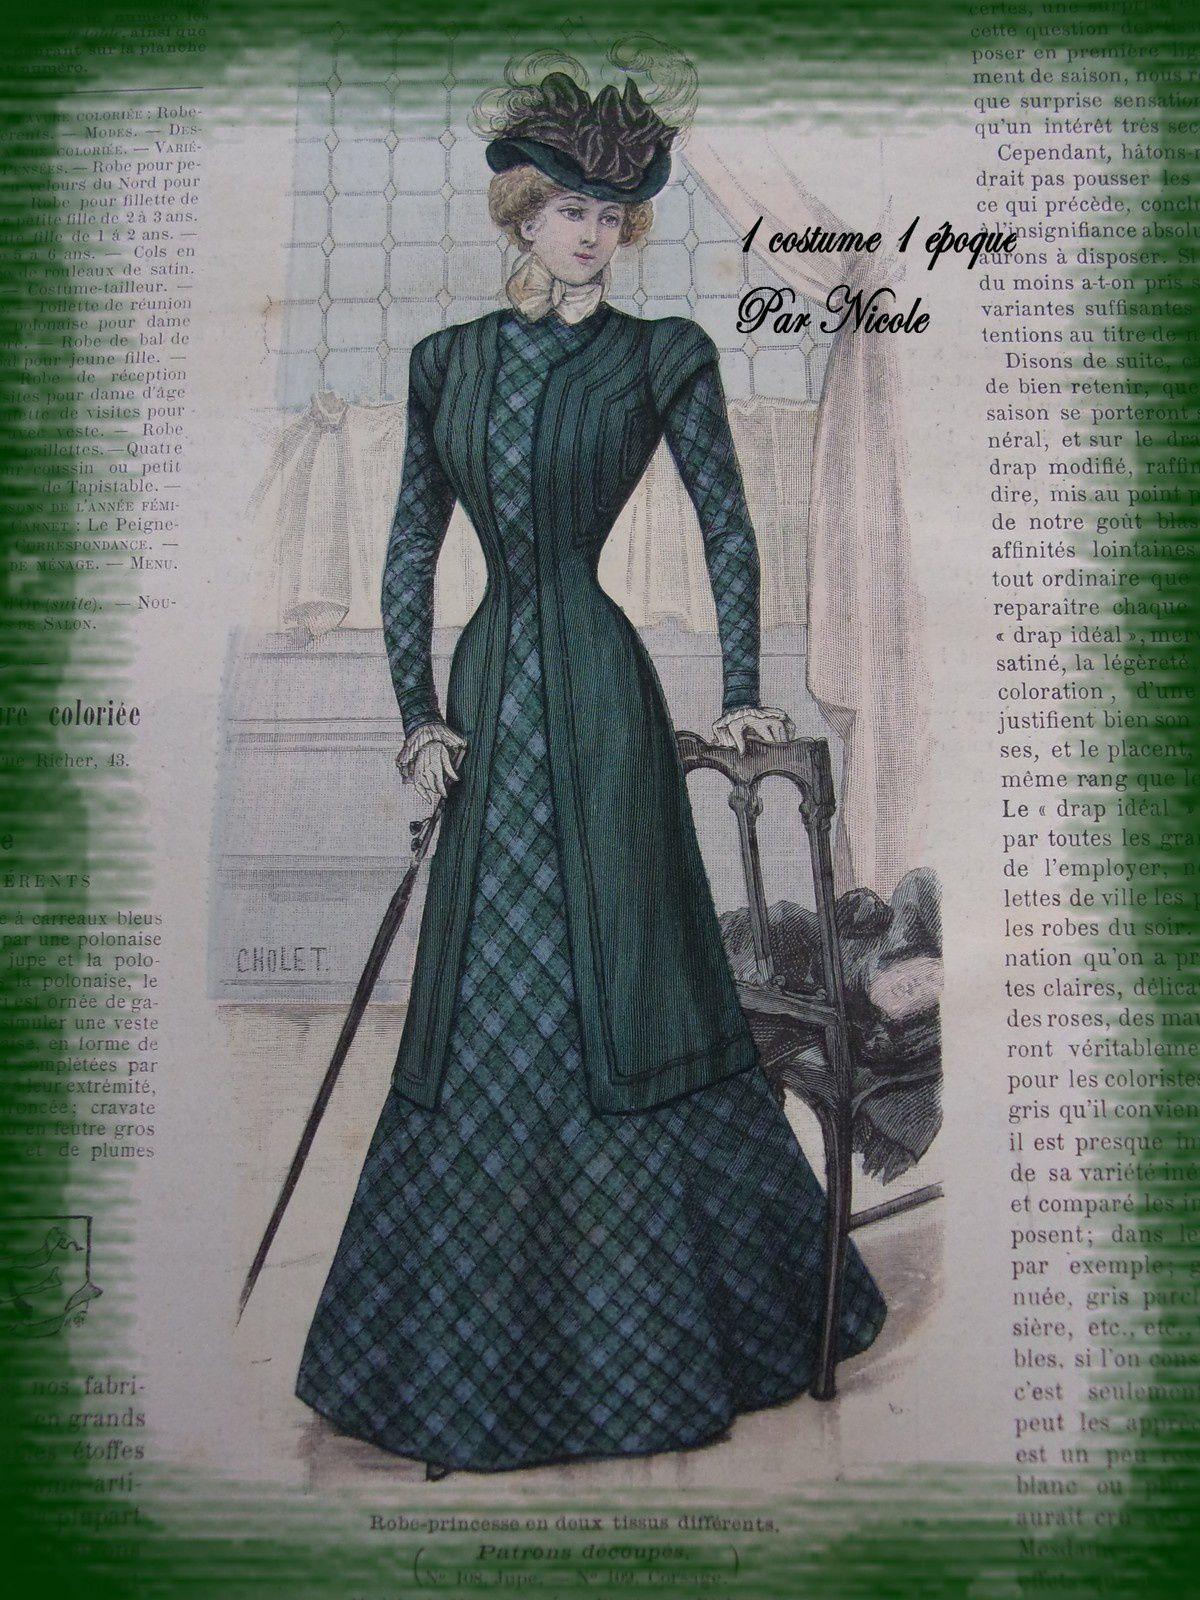 1 costume 1époque: l'automne 1898